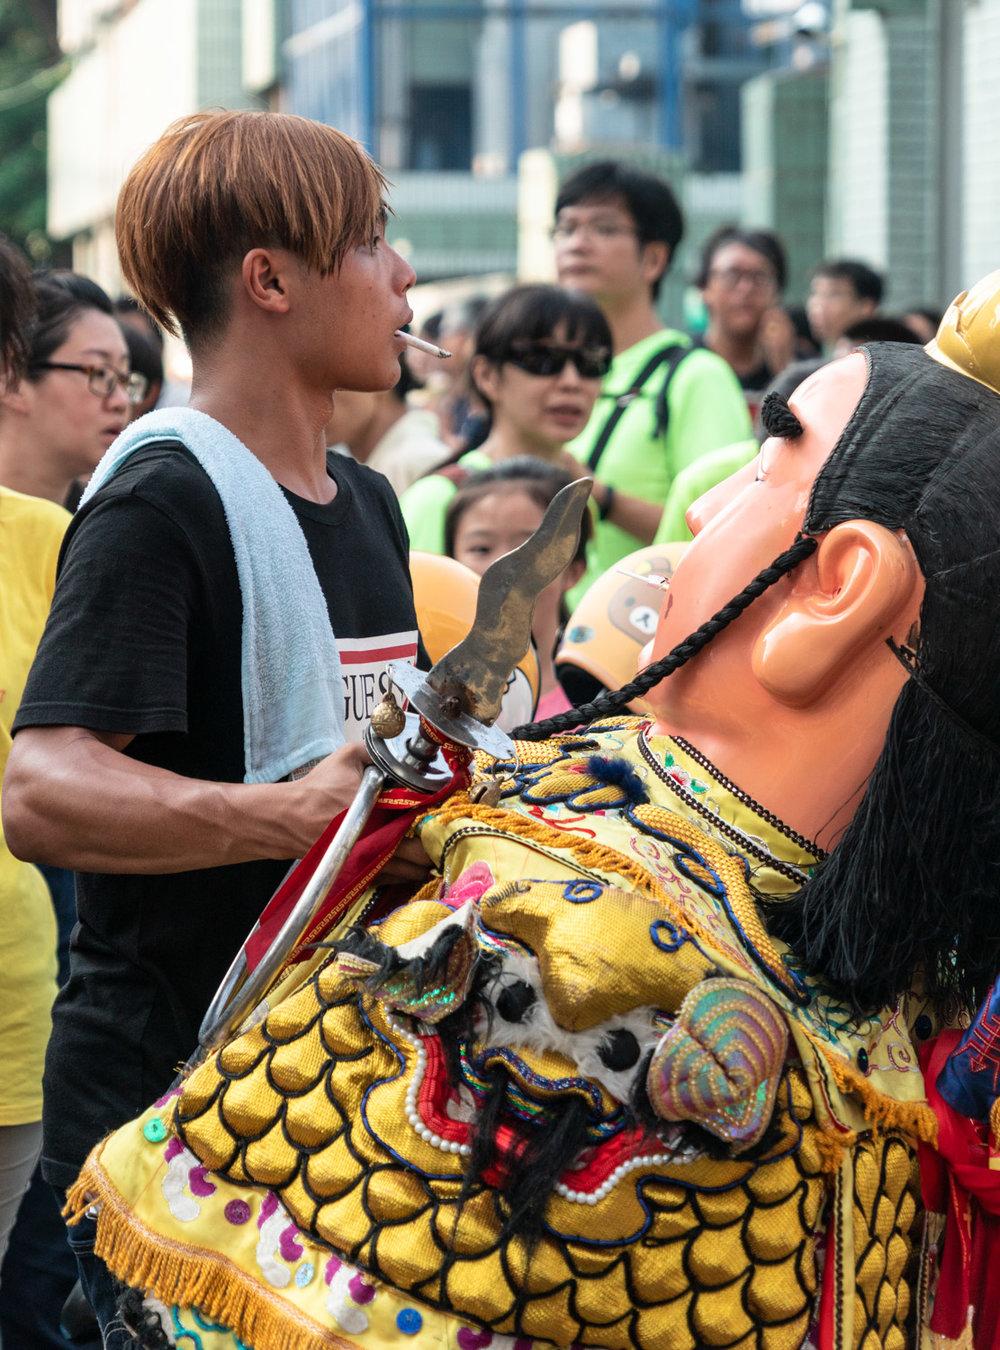 amaris-woo-photography-hsinchu-taiwan